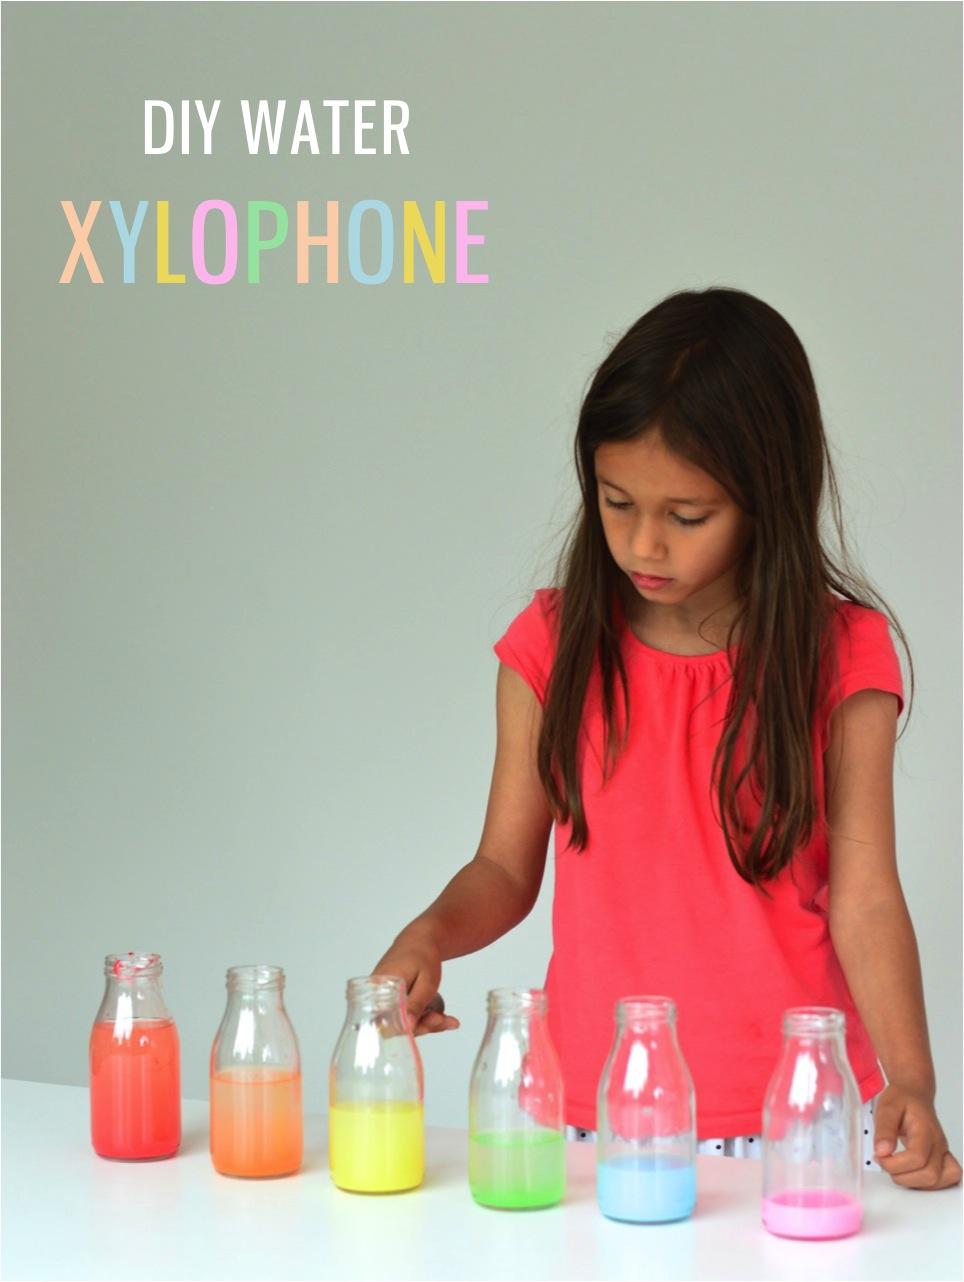 DIY water xylophone